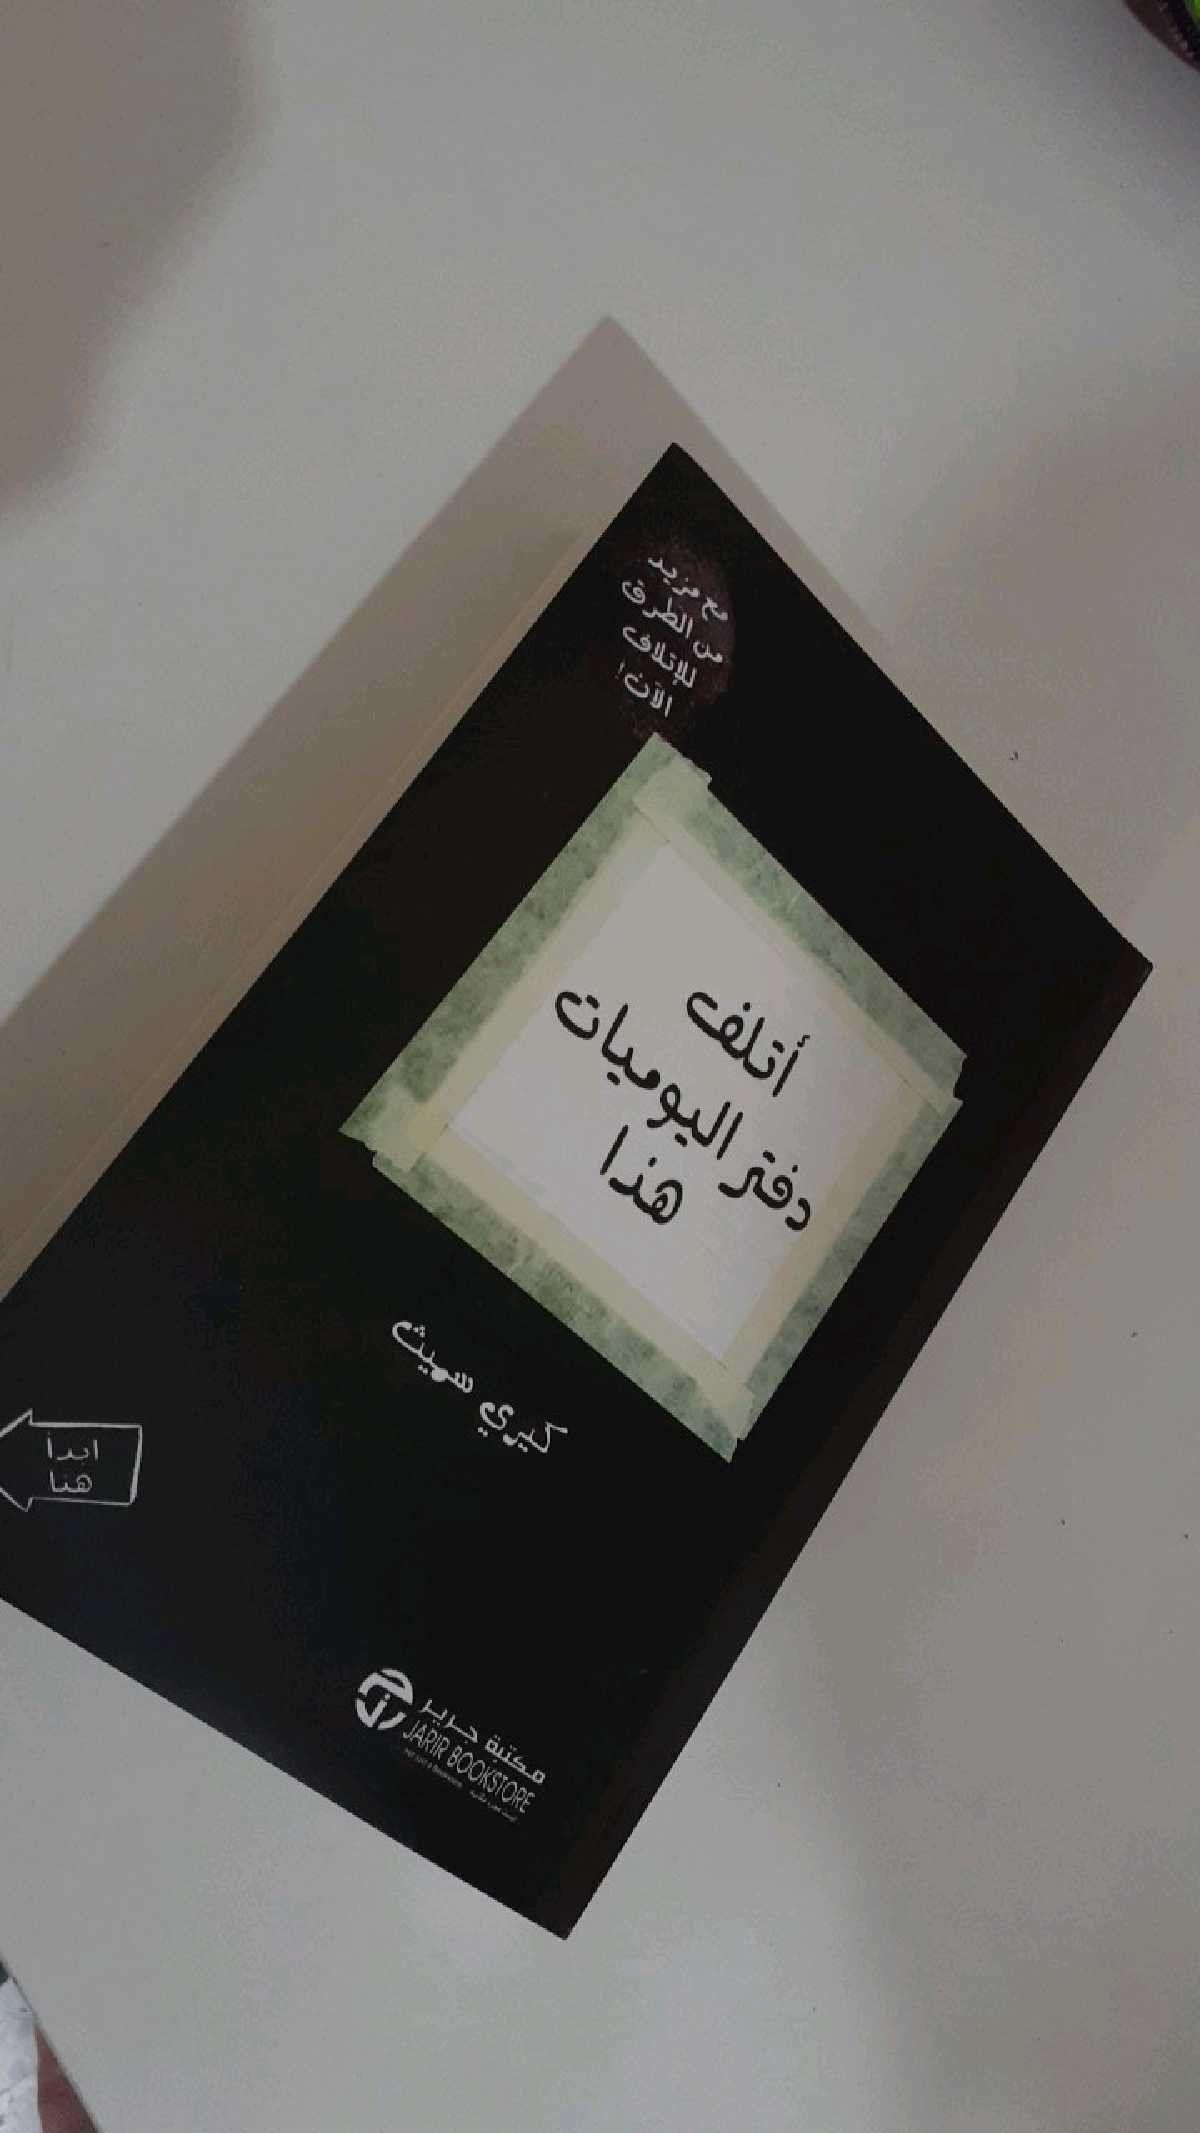 Pin By Jijel Jijel On اتلف دفتر اليوميات هذا Books Frame Novels